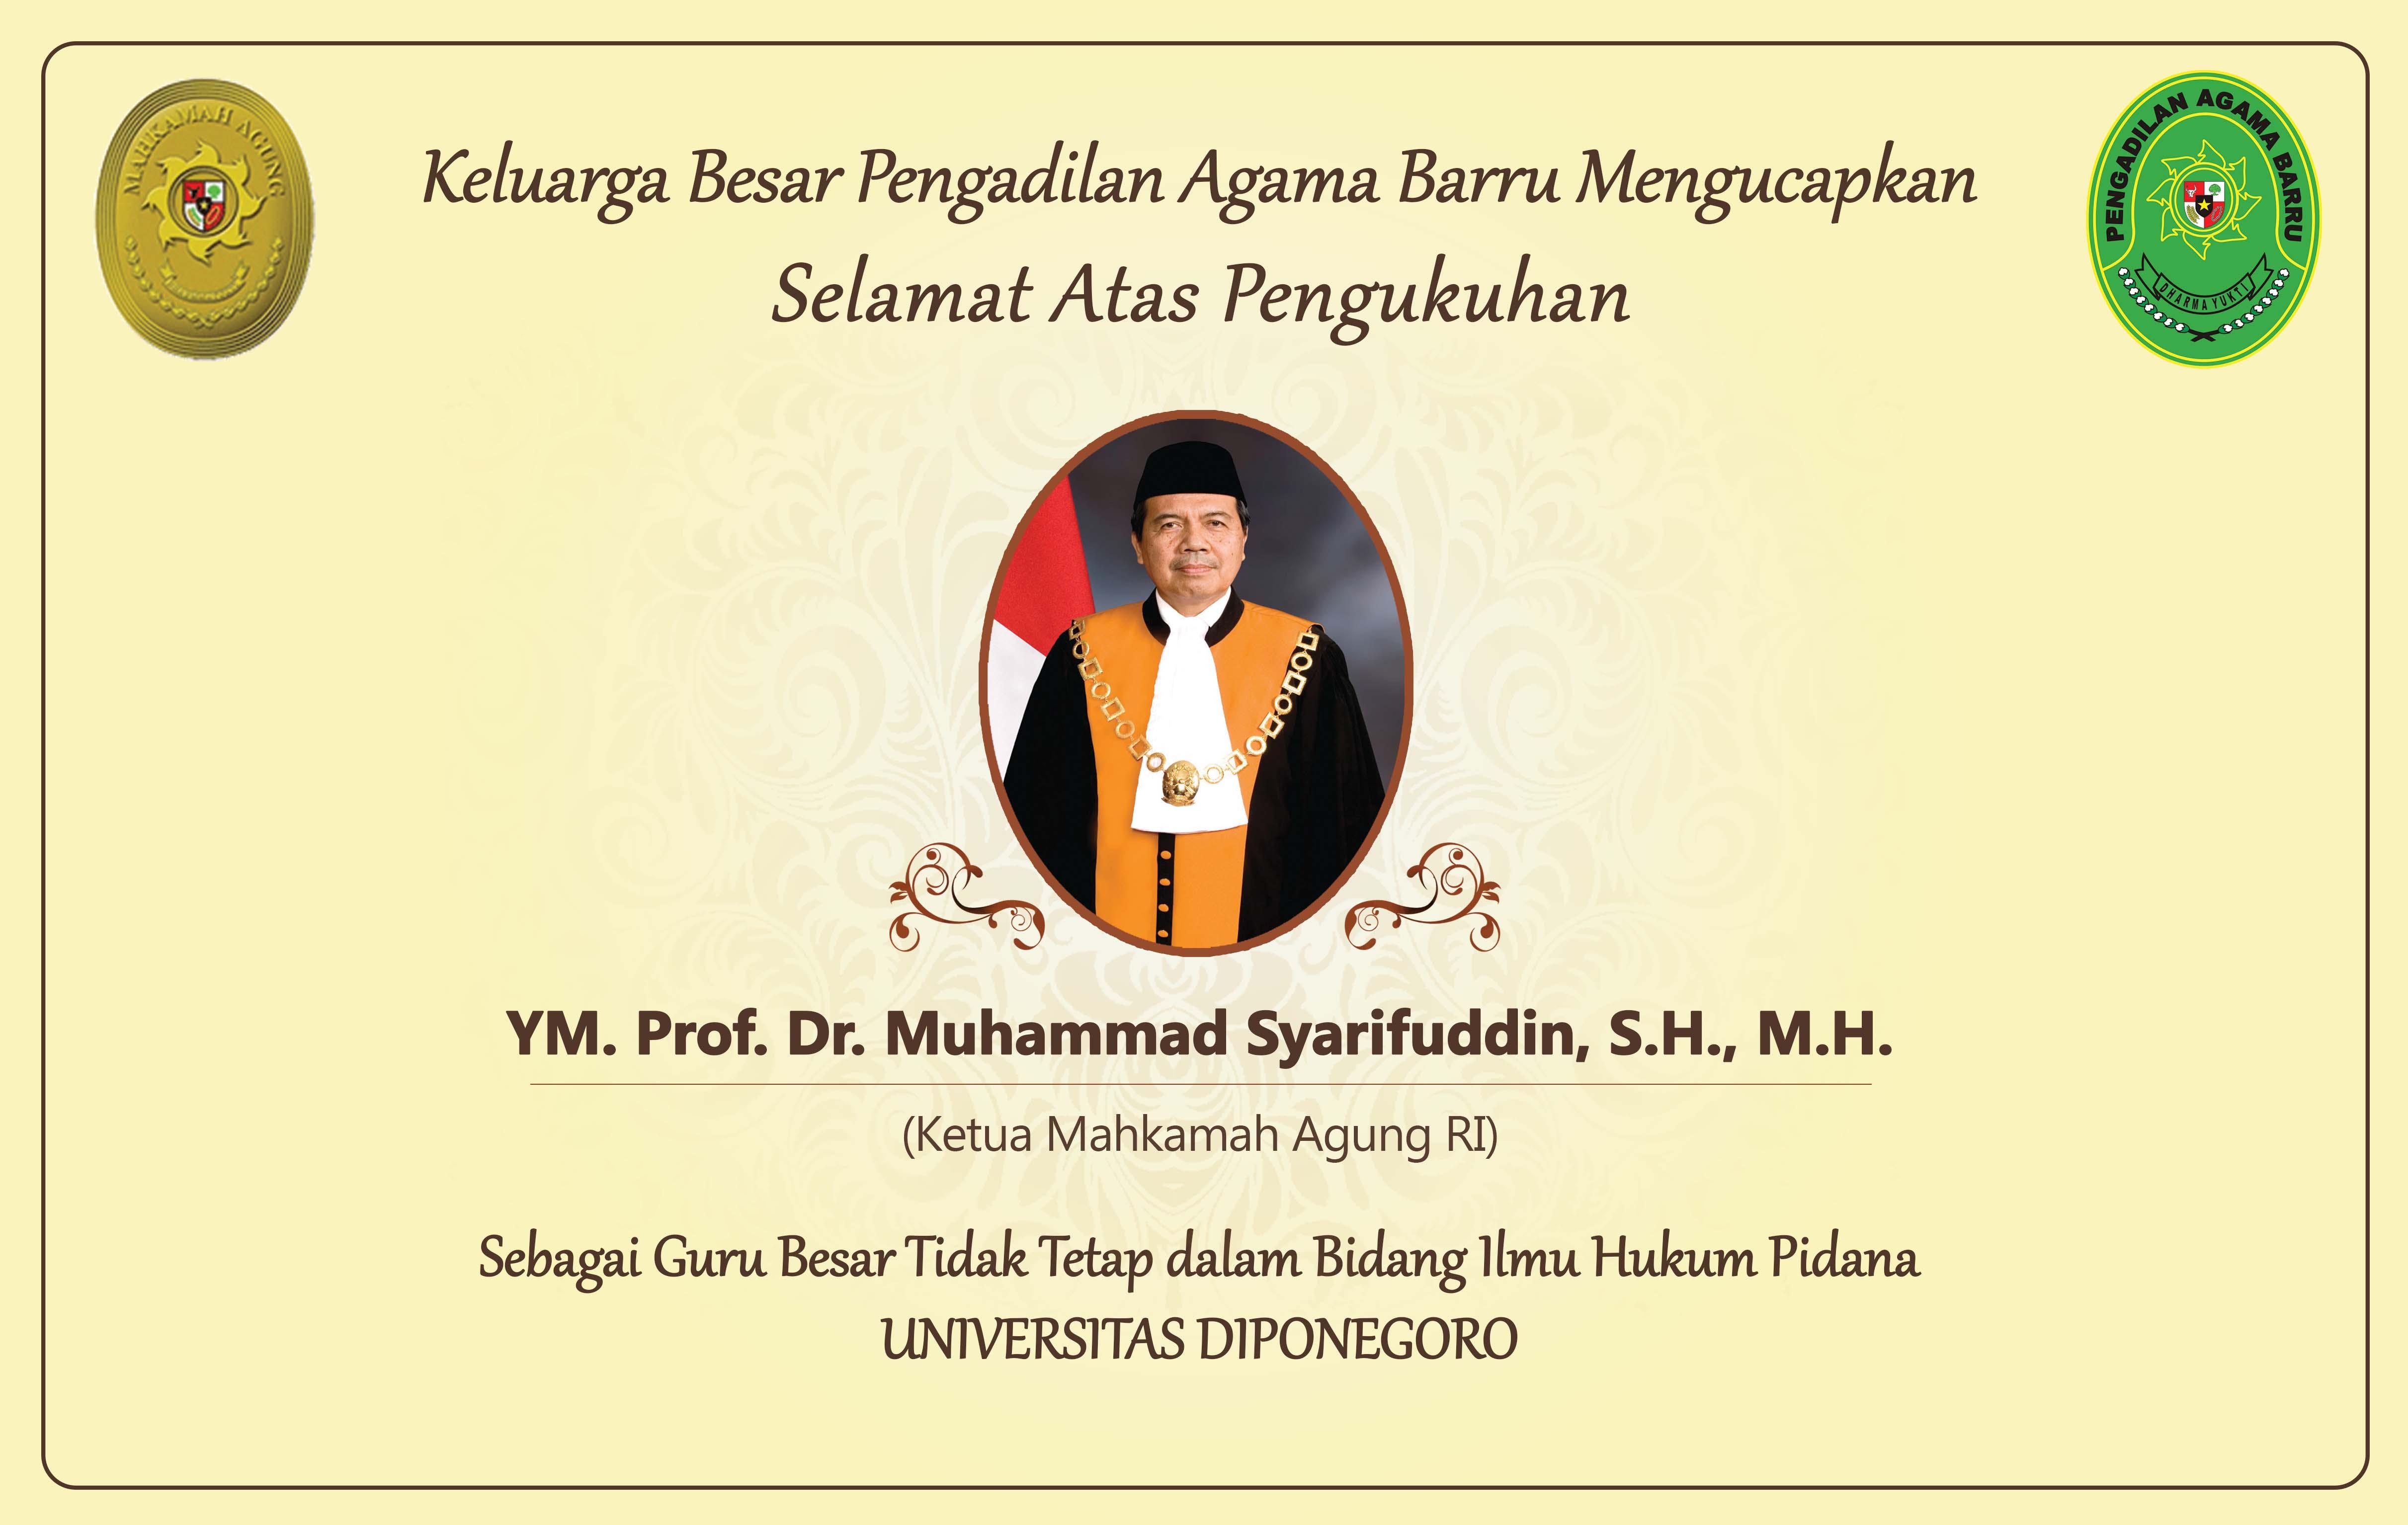 Selamat Atas Pengukuhan Guru Besar